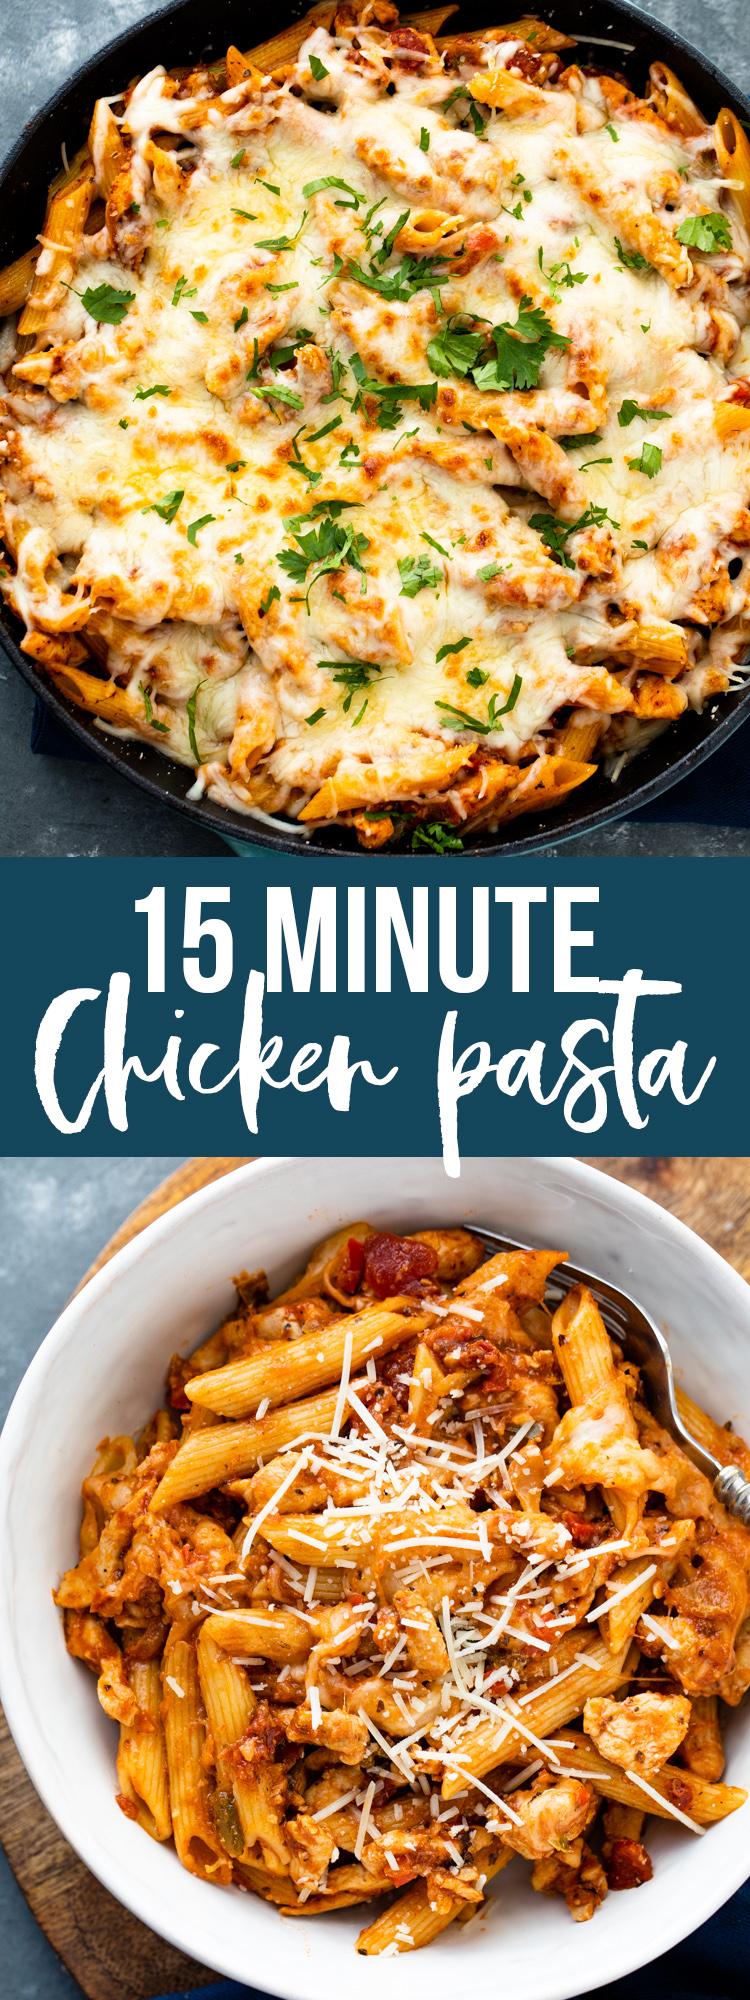 15 Minute Chicken Pasta Gimme Delicious